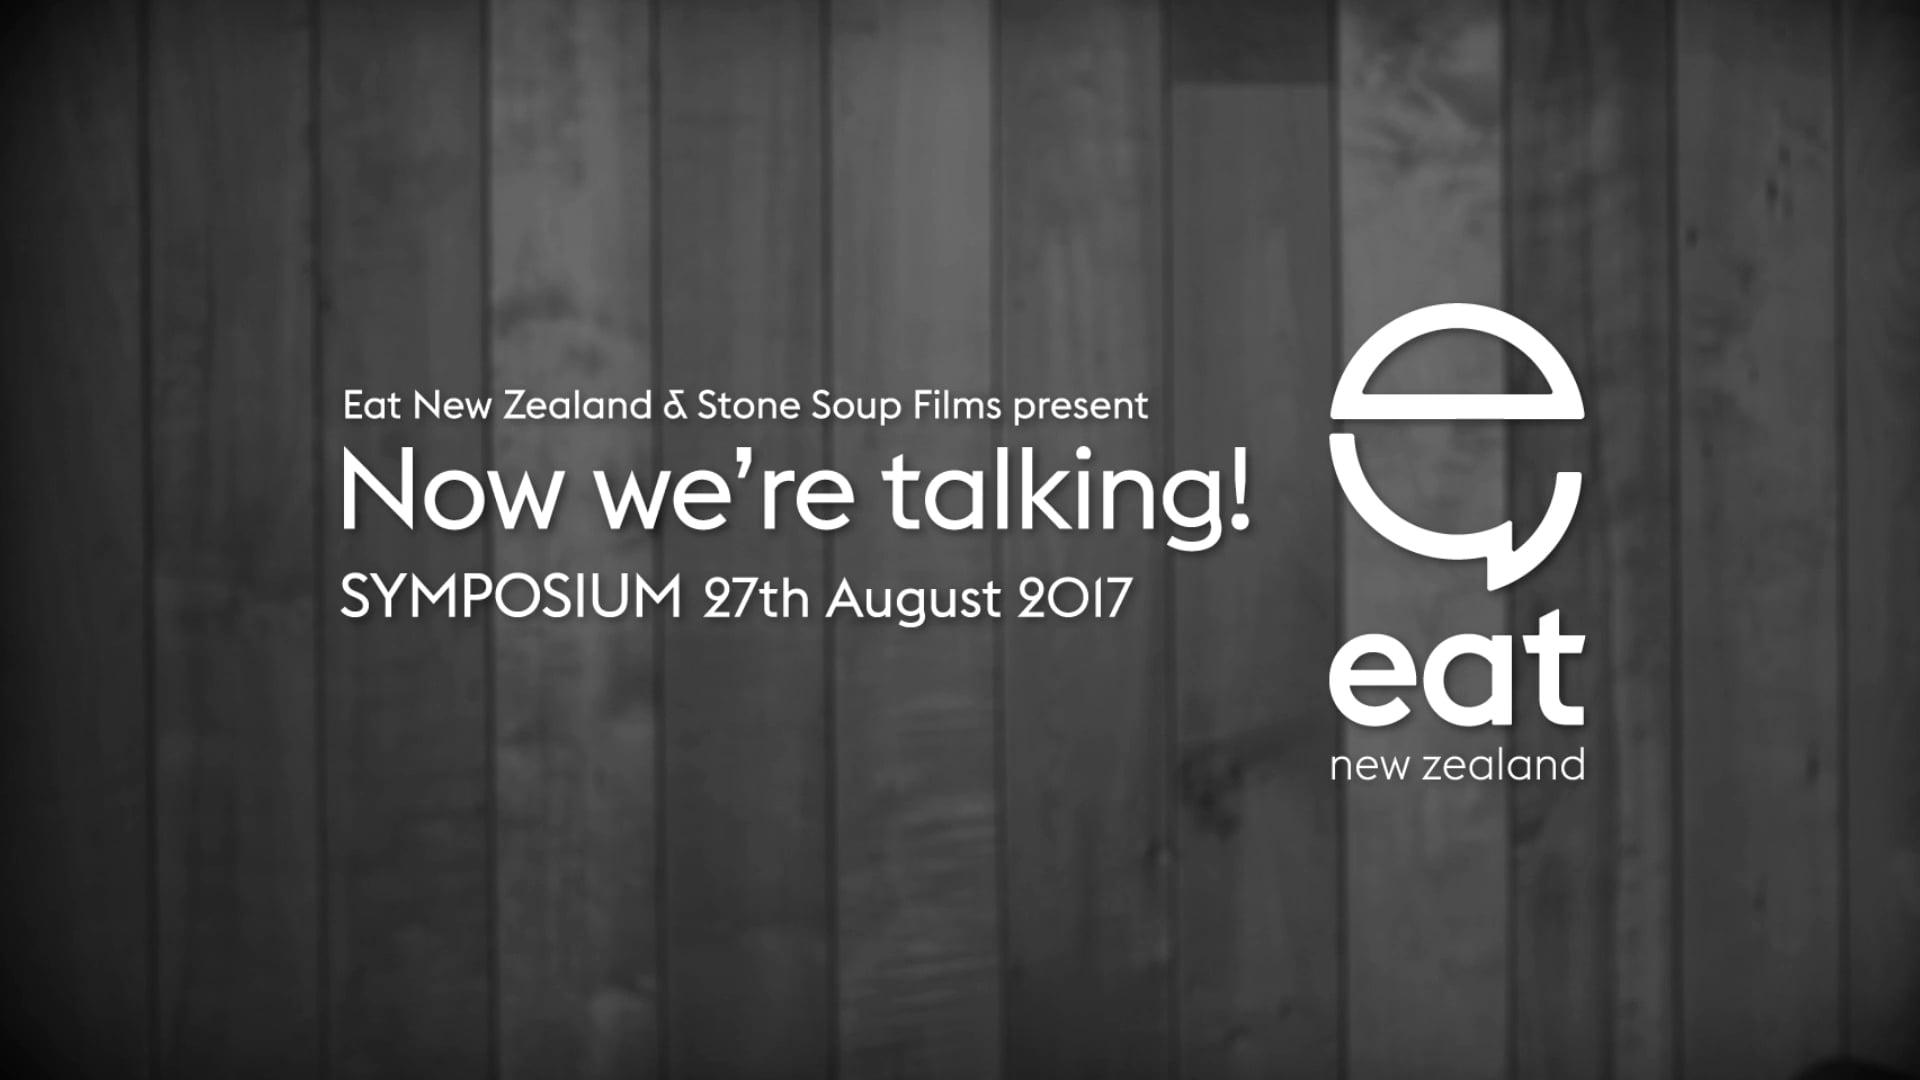 Eat New Zealand. Now we're talking! Syposium 2017